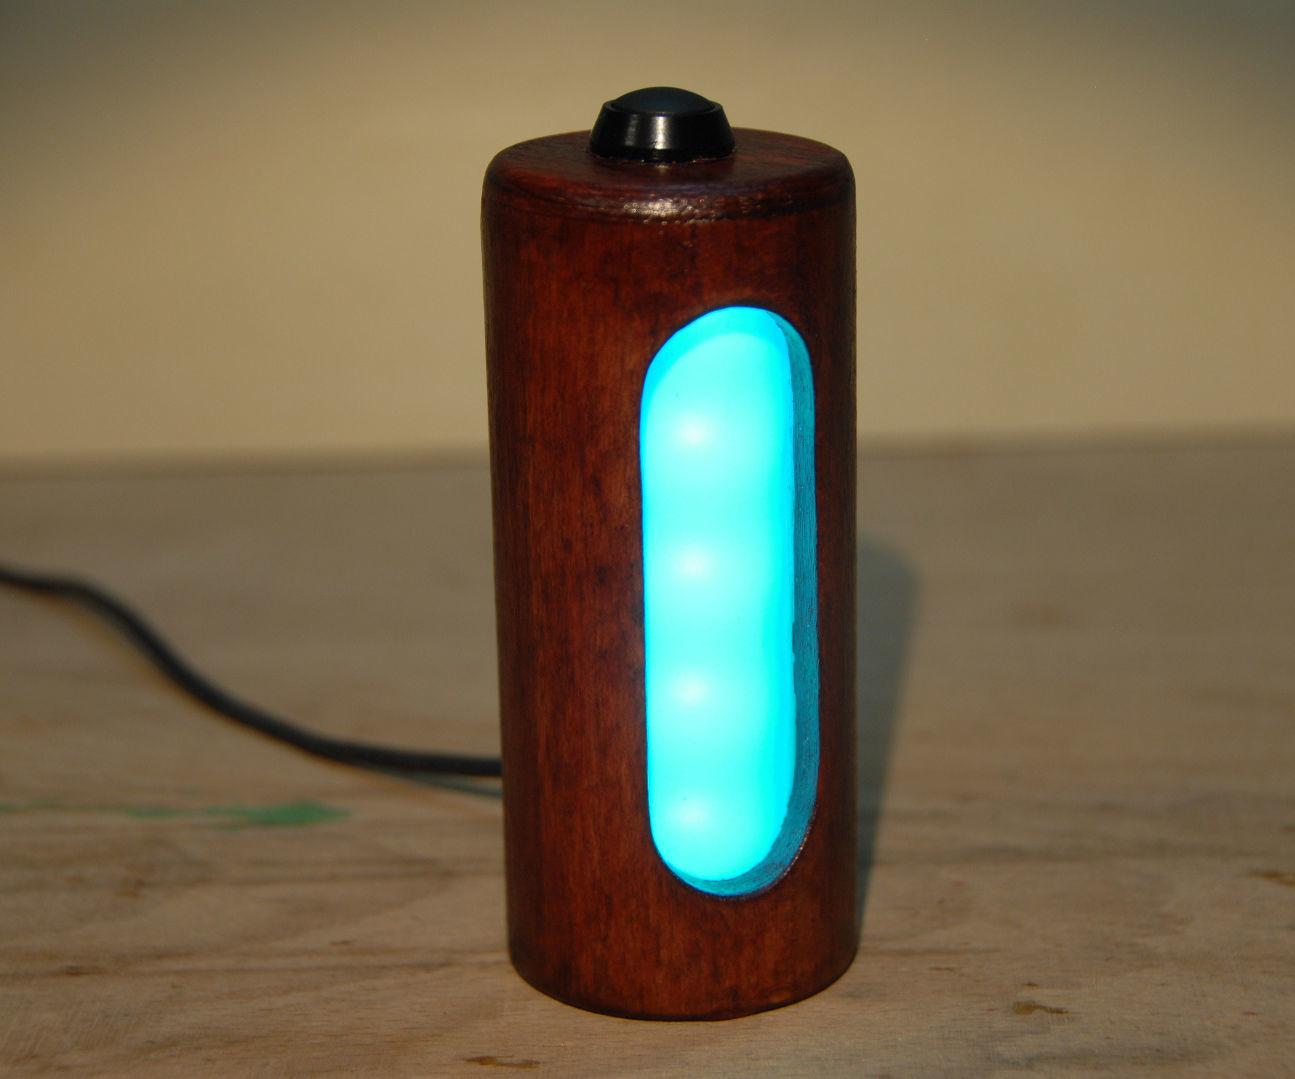 Wooden USB-powered RGB-LED lamp